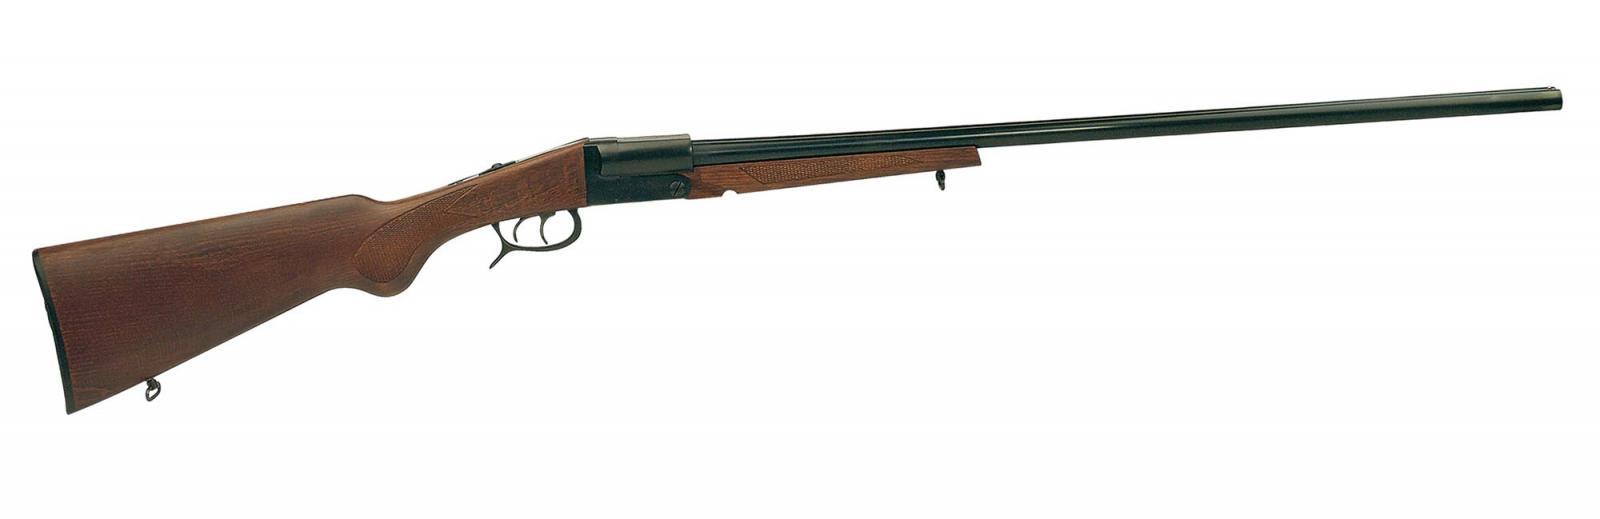 Fusil juxtaposé pliant FALCO cal. 410